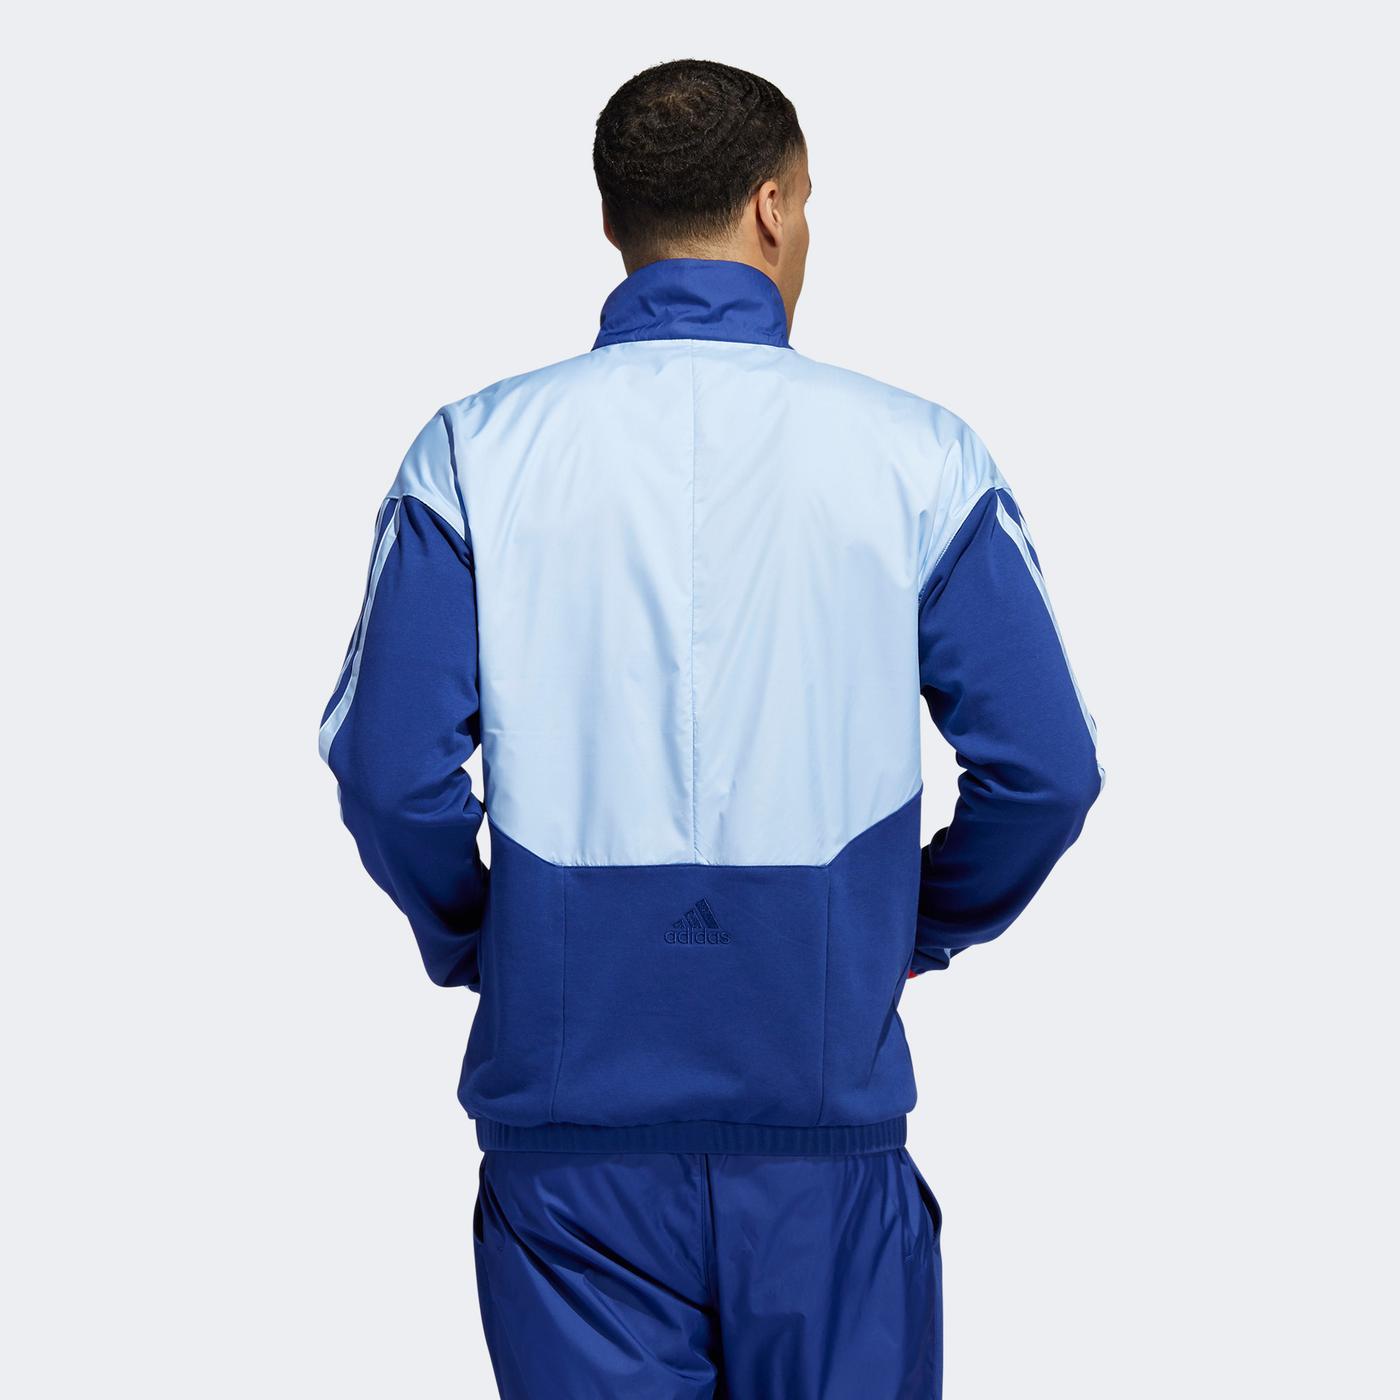 adidas Erkek Mavi Eşofman Üstü